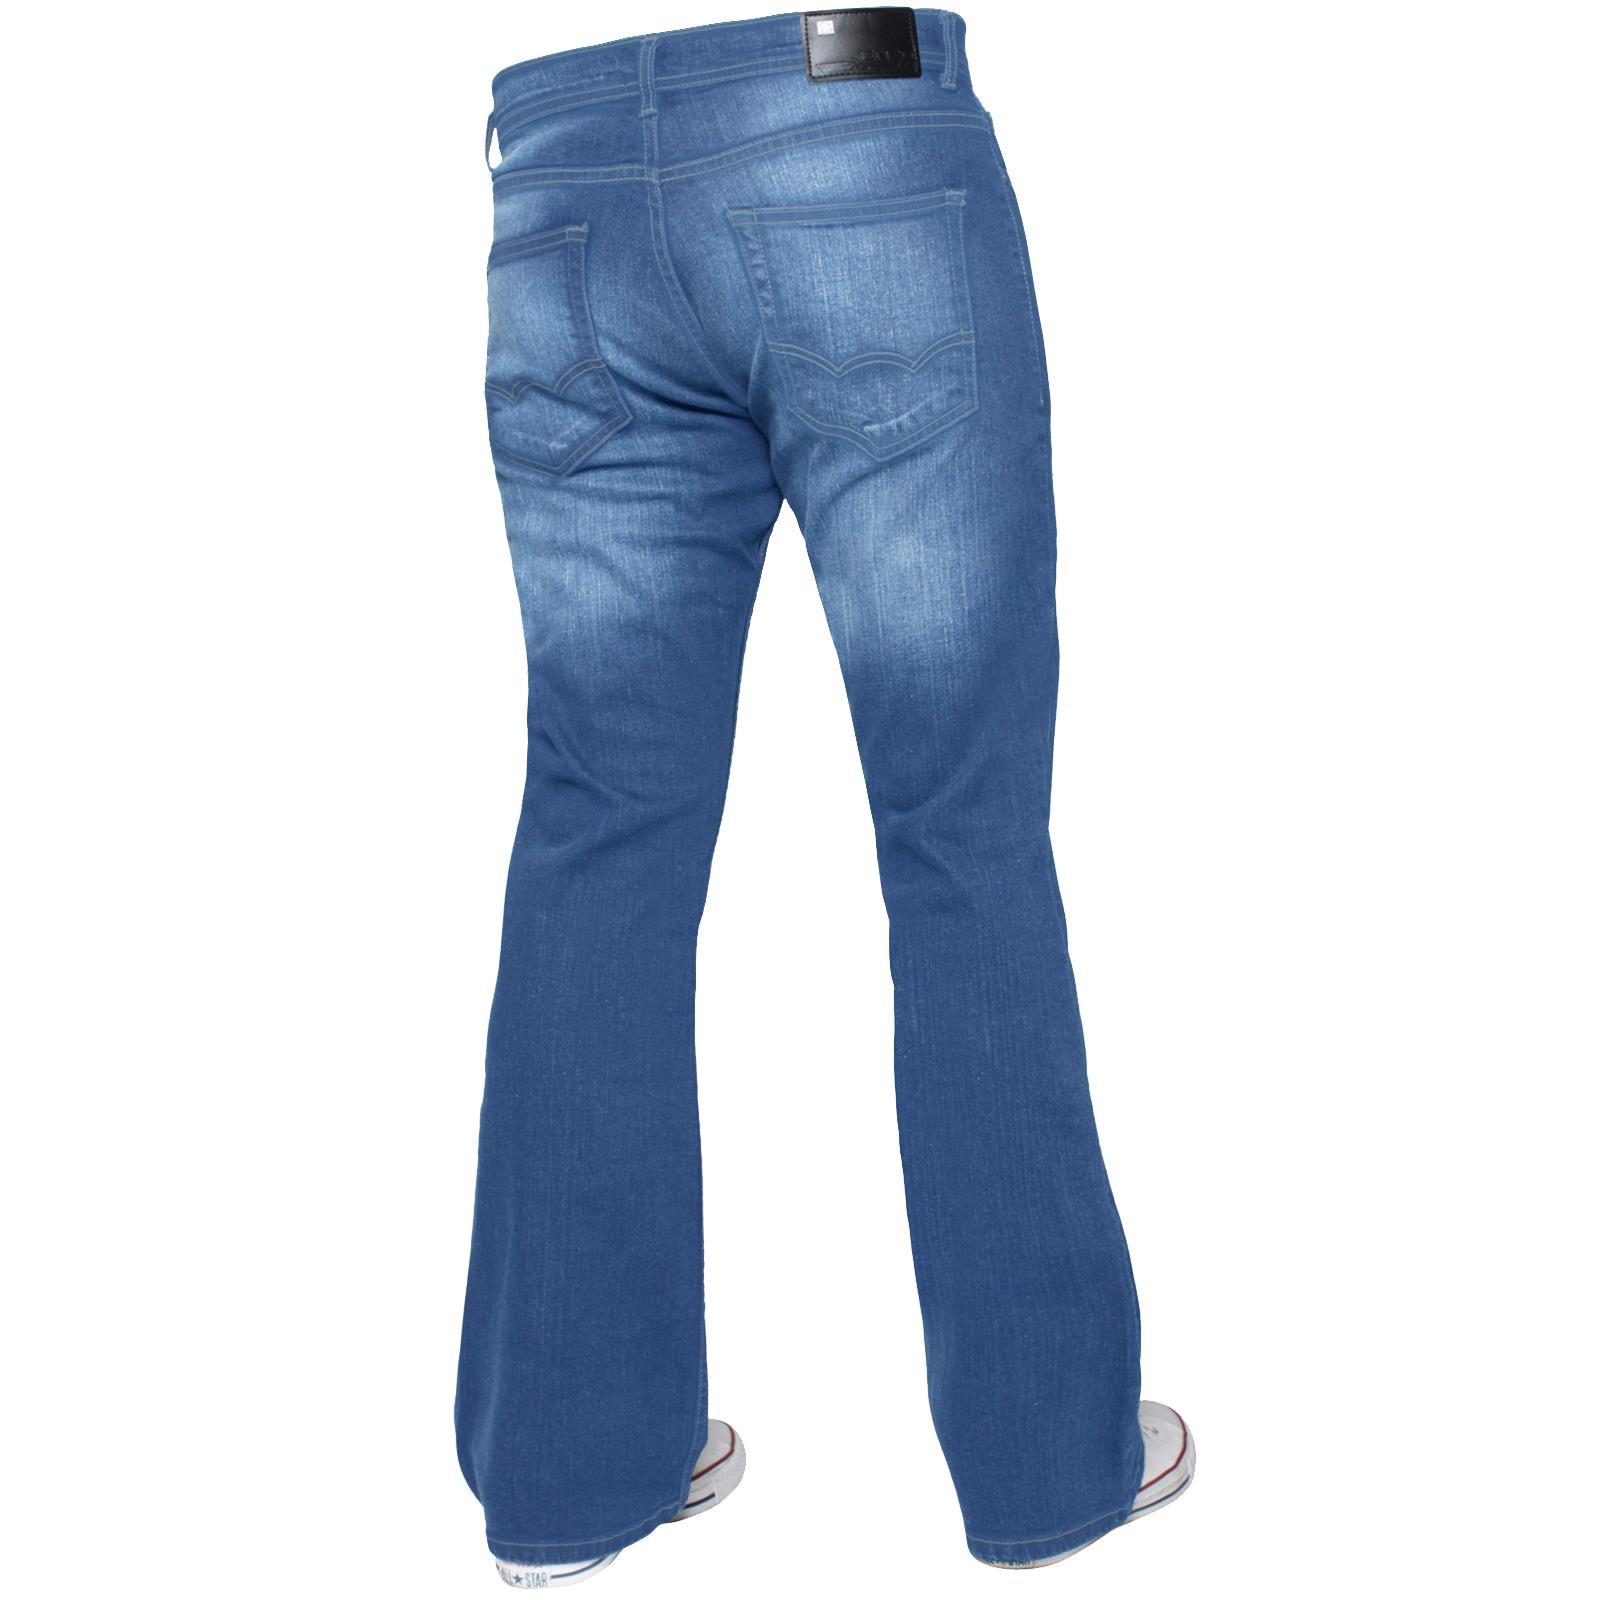 Enzo-Mens-Big-Tall-Jeans-Leg-King-Size-Denim-Pants-Chino-Trousers-Pants-44-034-60-034 thumbnail 109